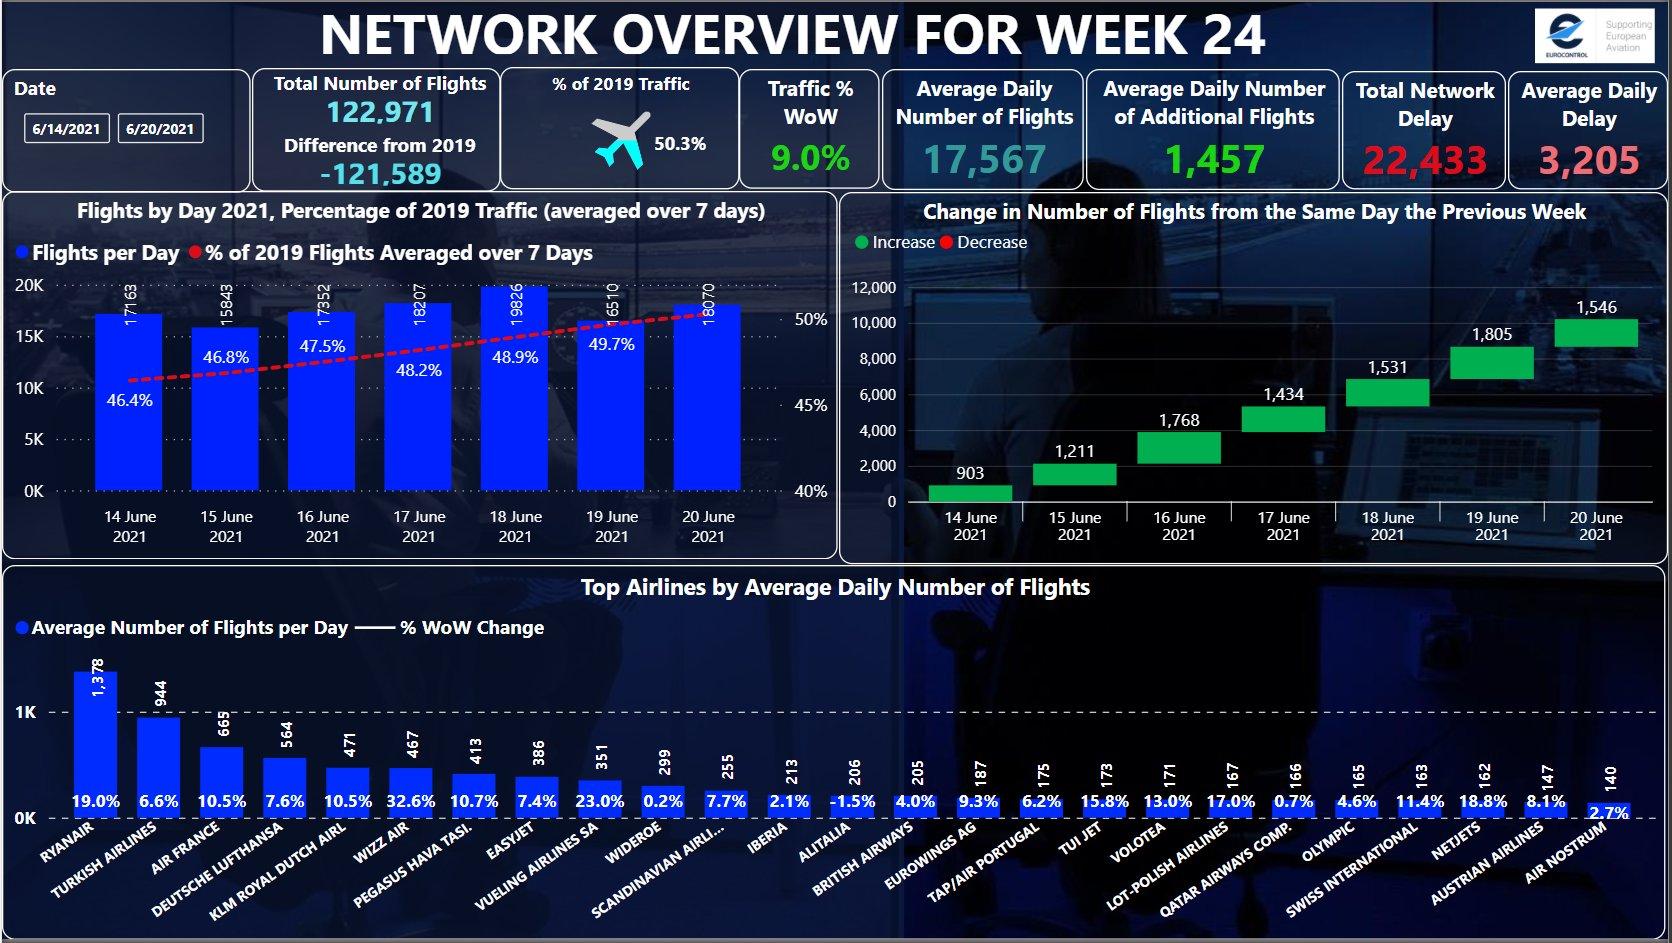 Eurocontrol Week 24